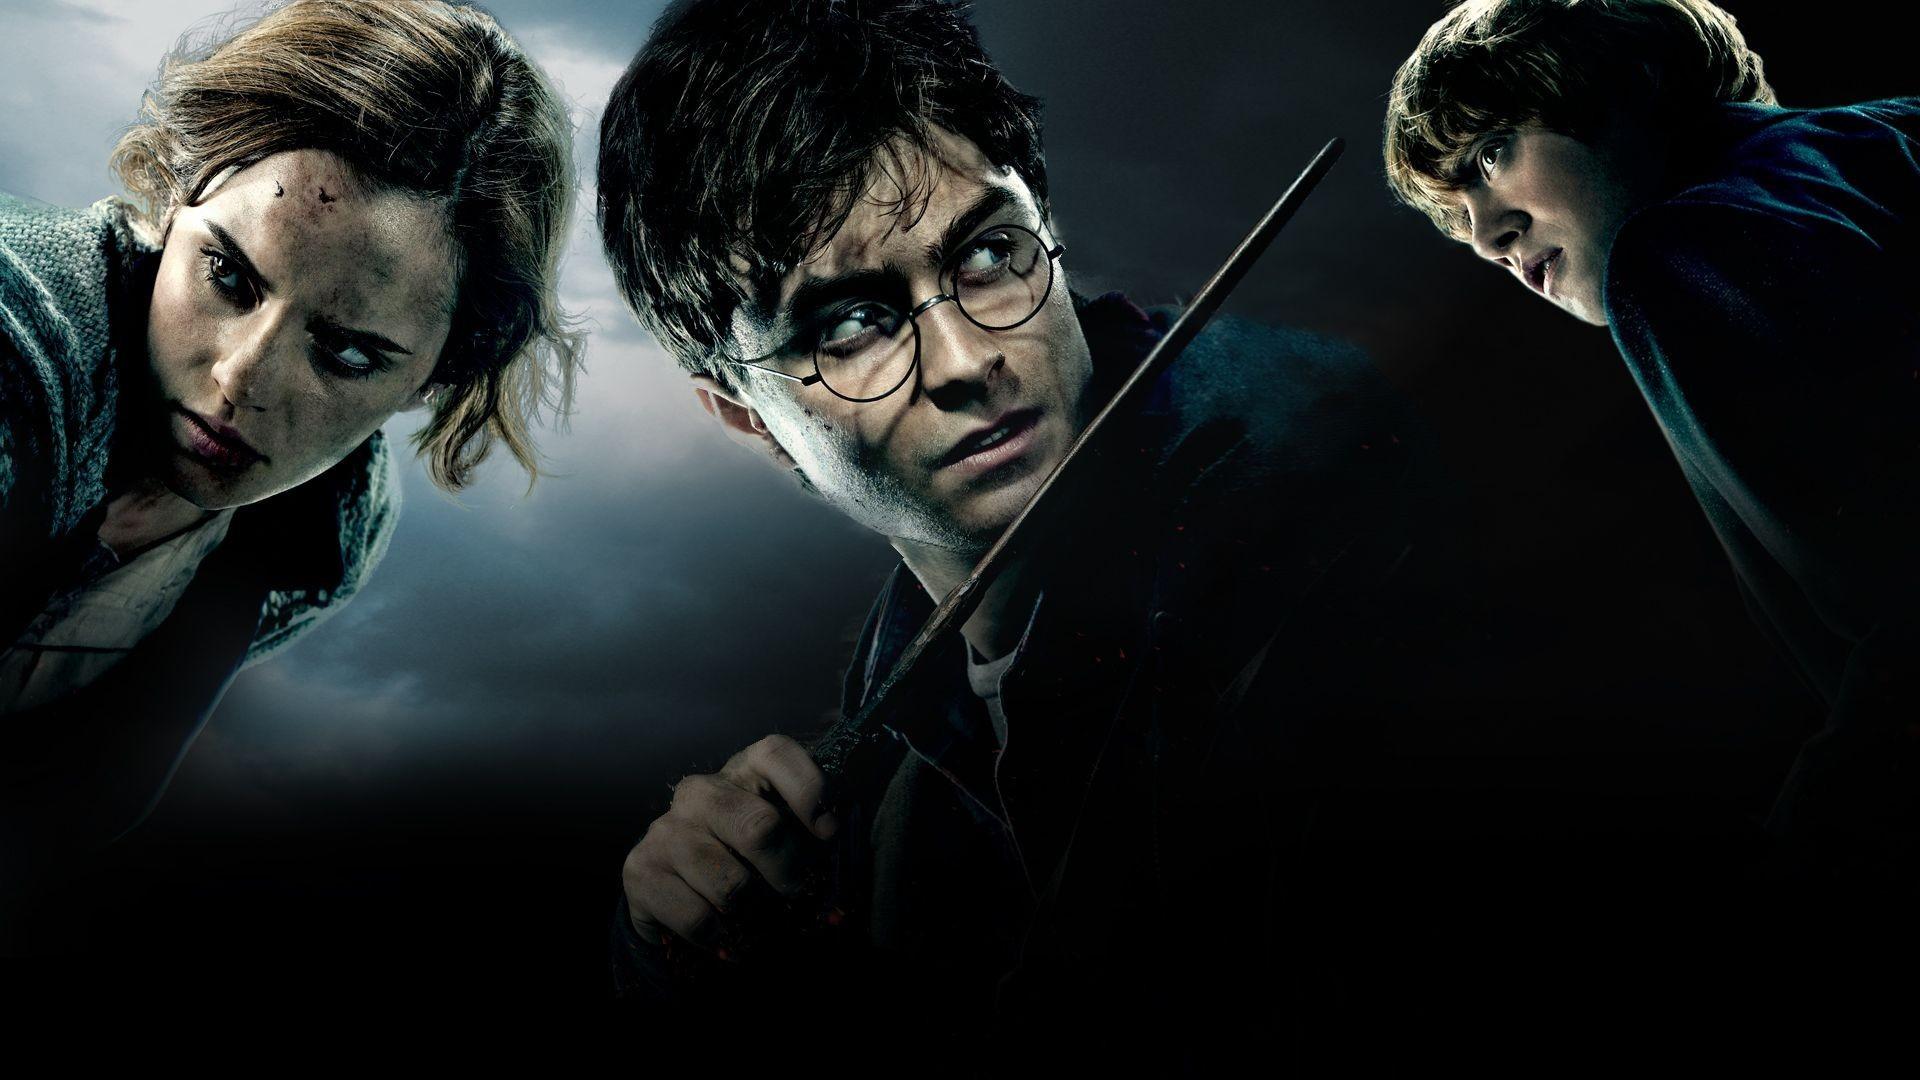 Beautiful Wallpaper Harry Potter Deathly Hallows - harry_potter_and_the_deathly_hallows_part_1-5  Trends_39368.jpg